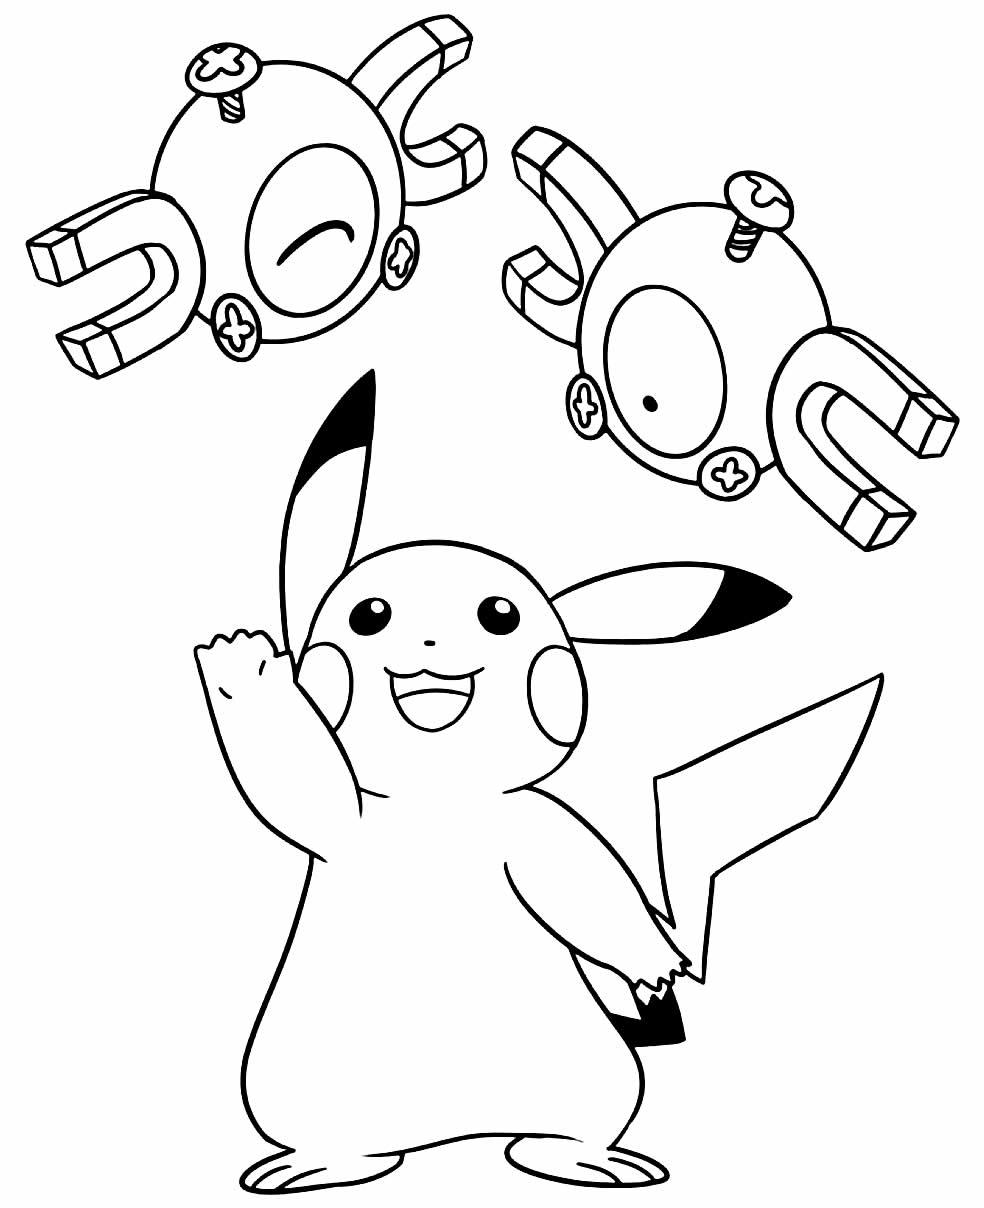 Pokémon image to color